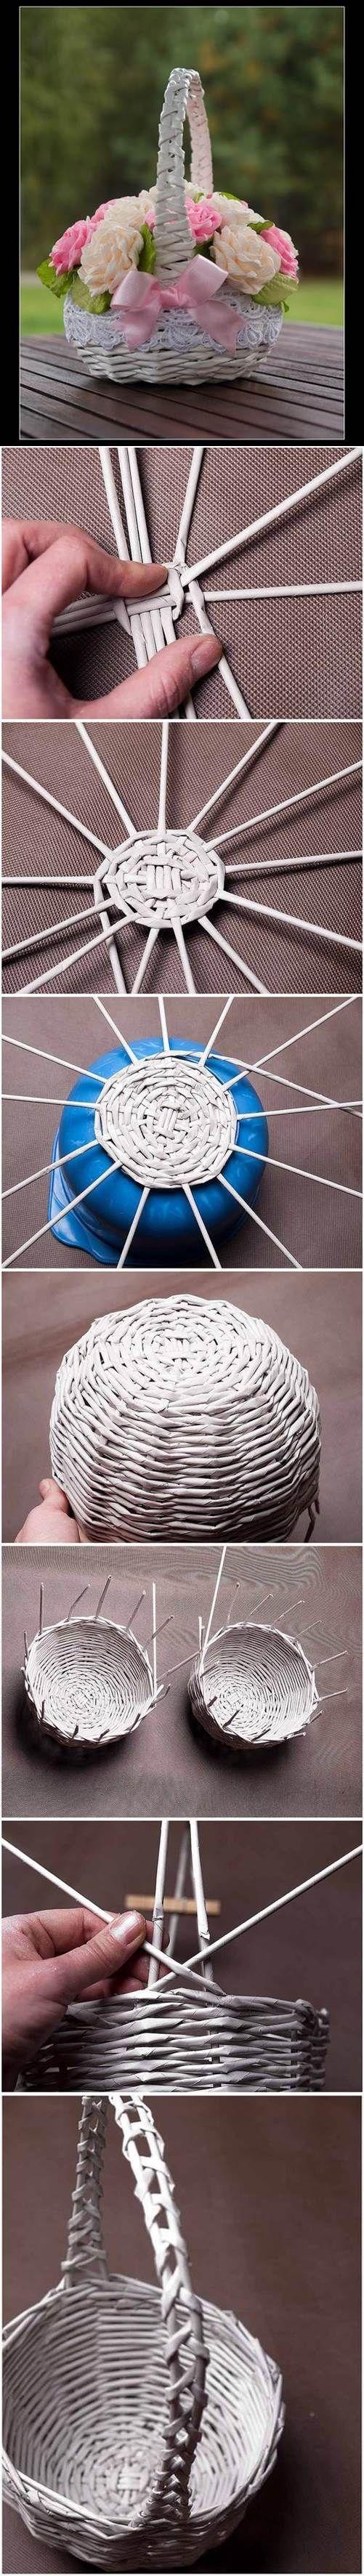 A simple basket of newspaper tubes 43